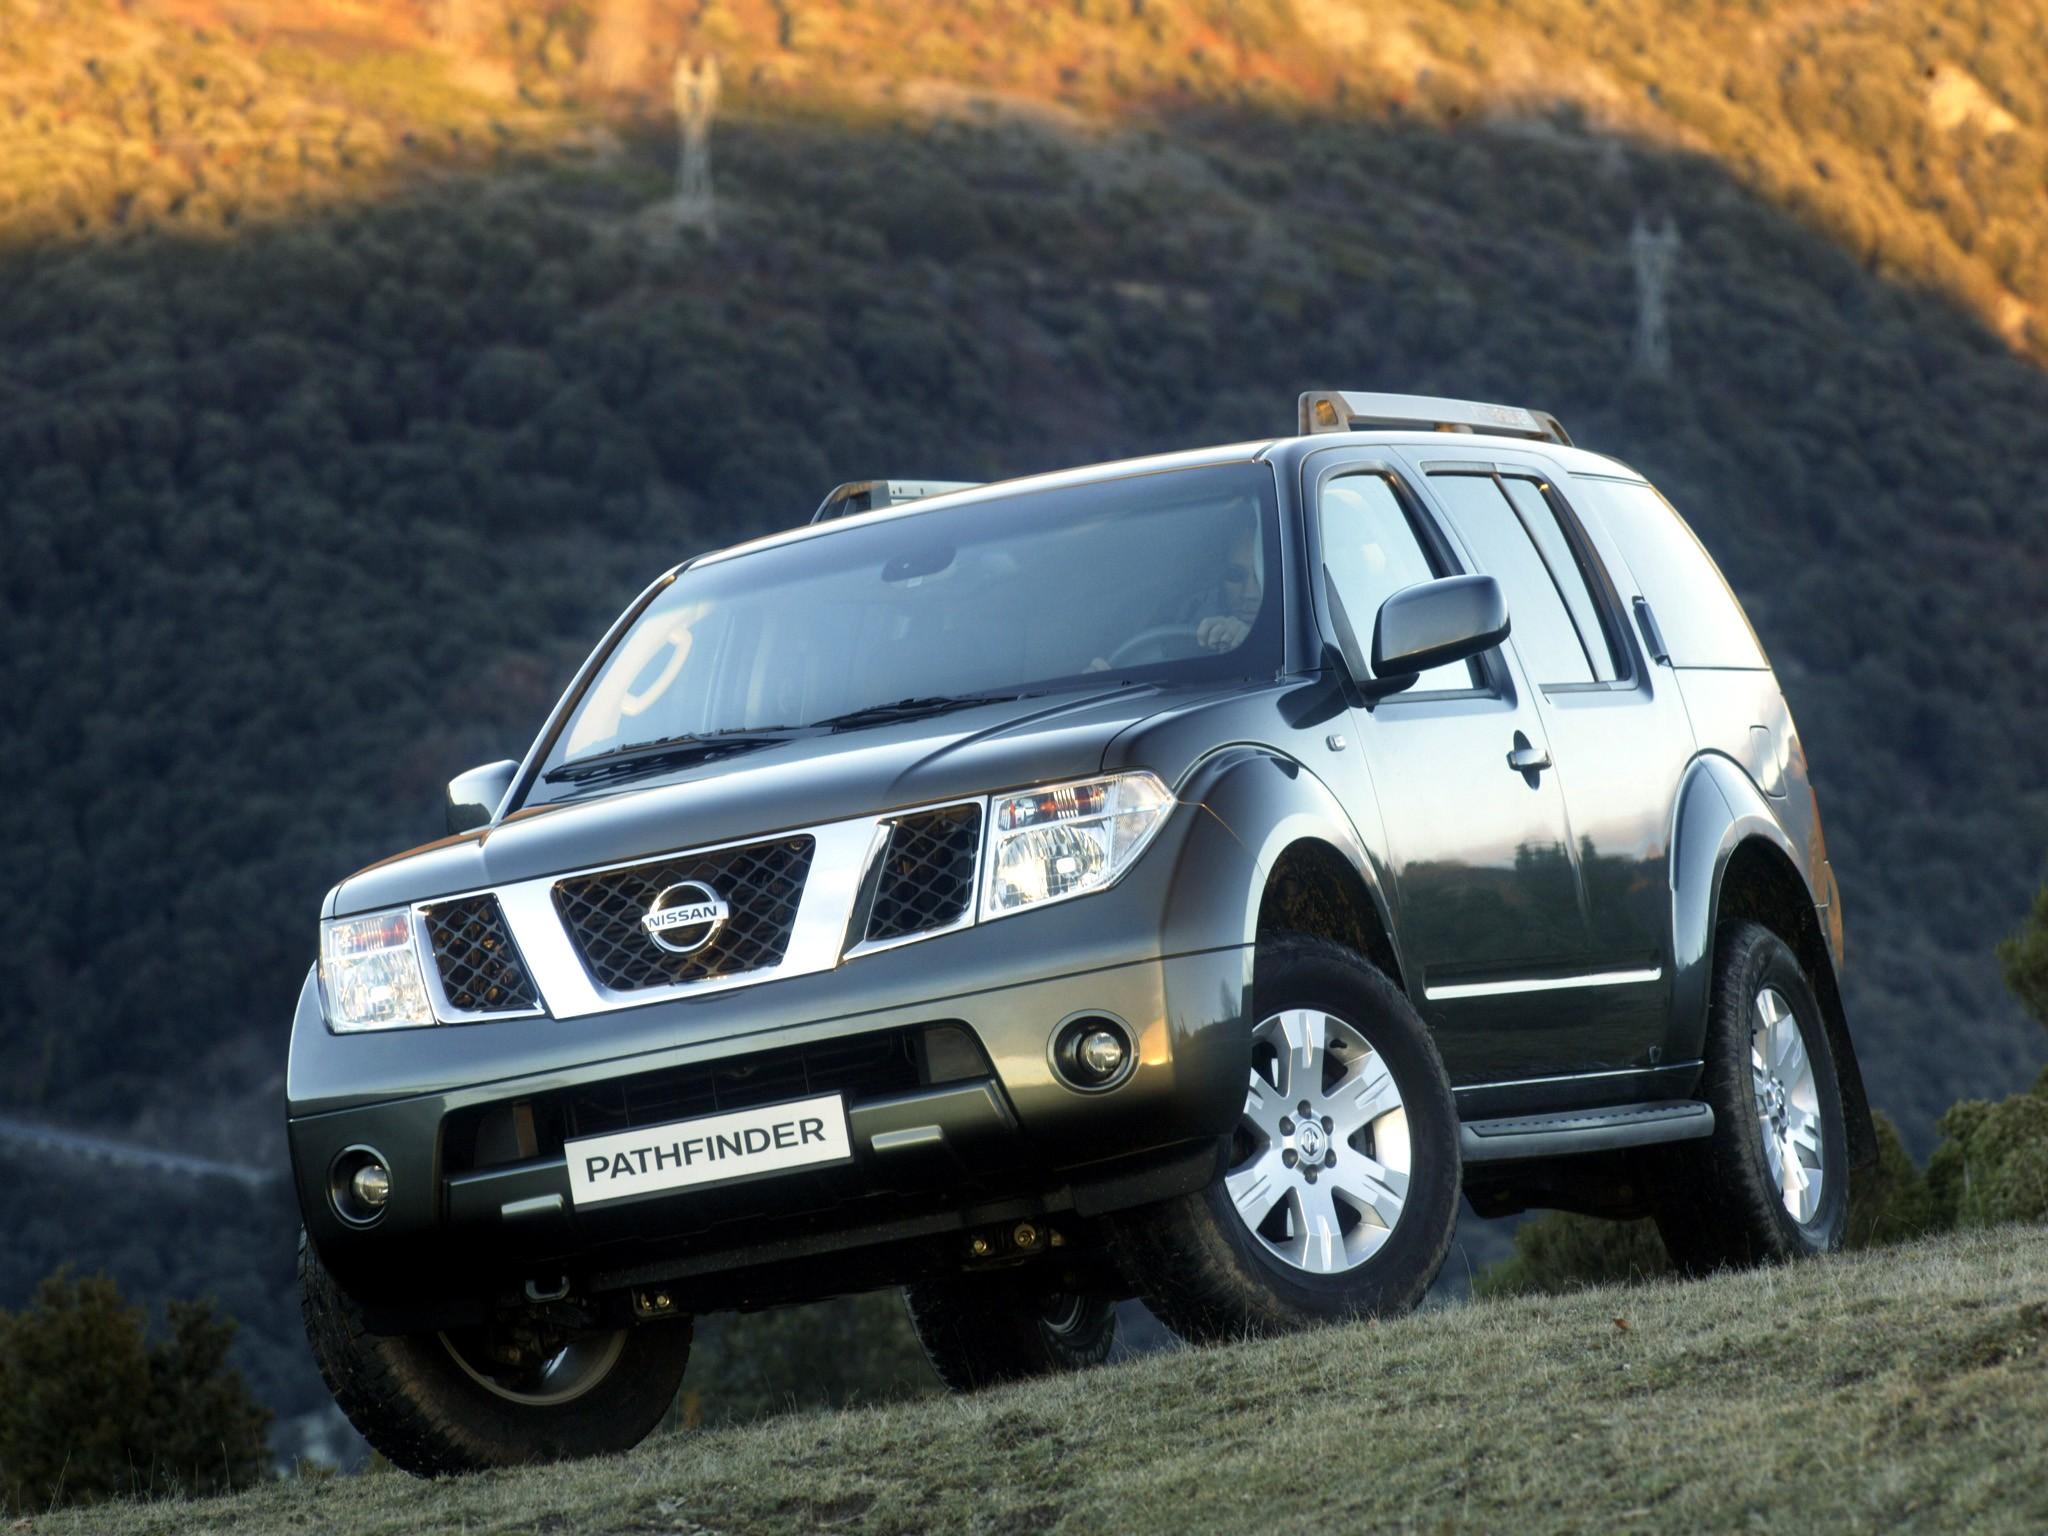 pathfinder nissan 2007 2008 autoevolution 2009 specs